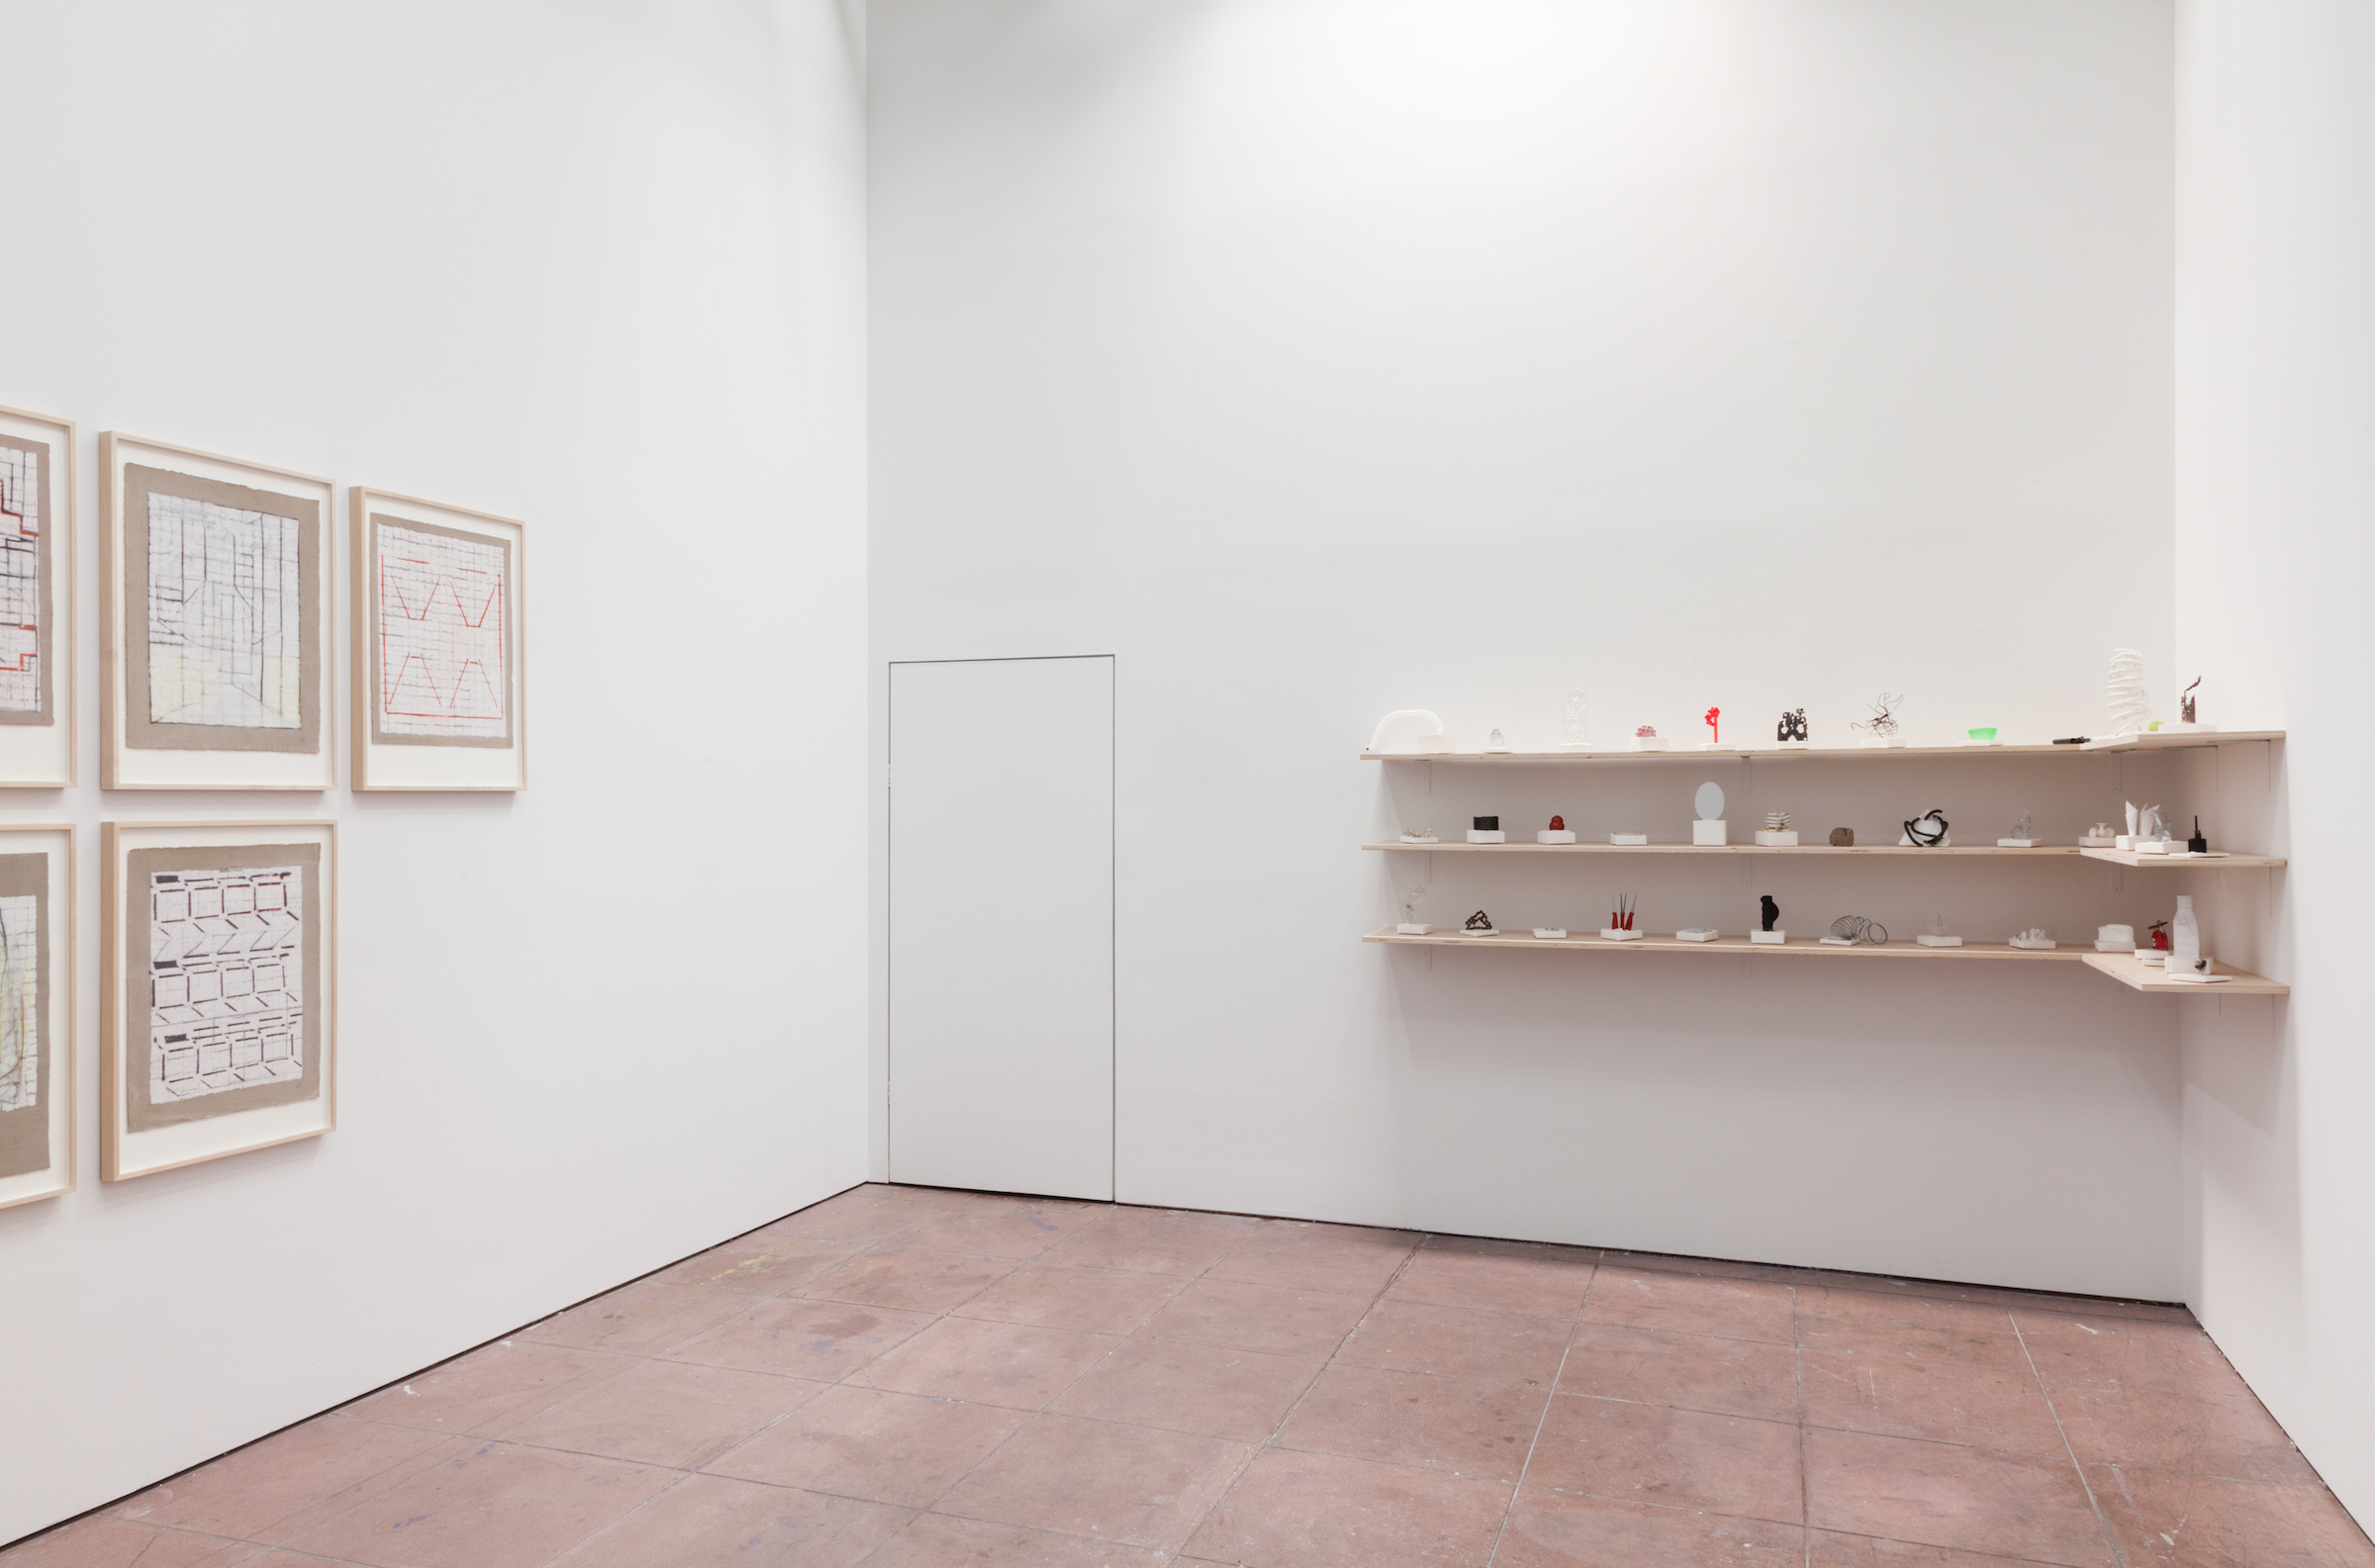 Installation view,  SLINKY , STL, LA, 2018-